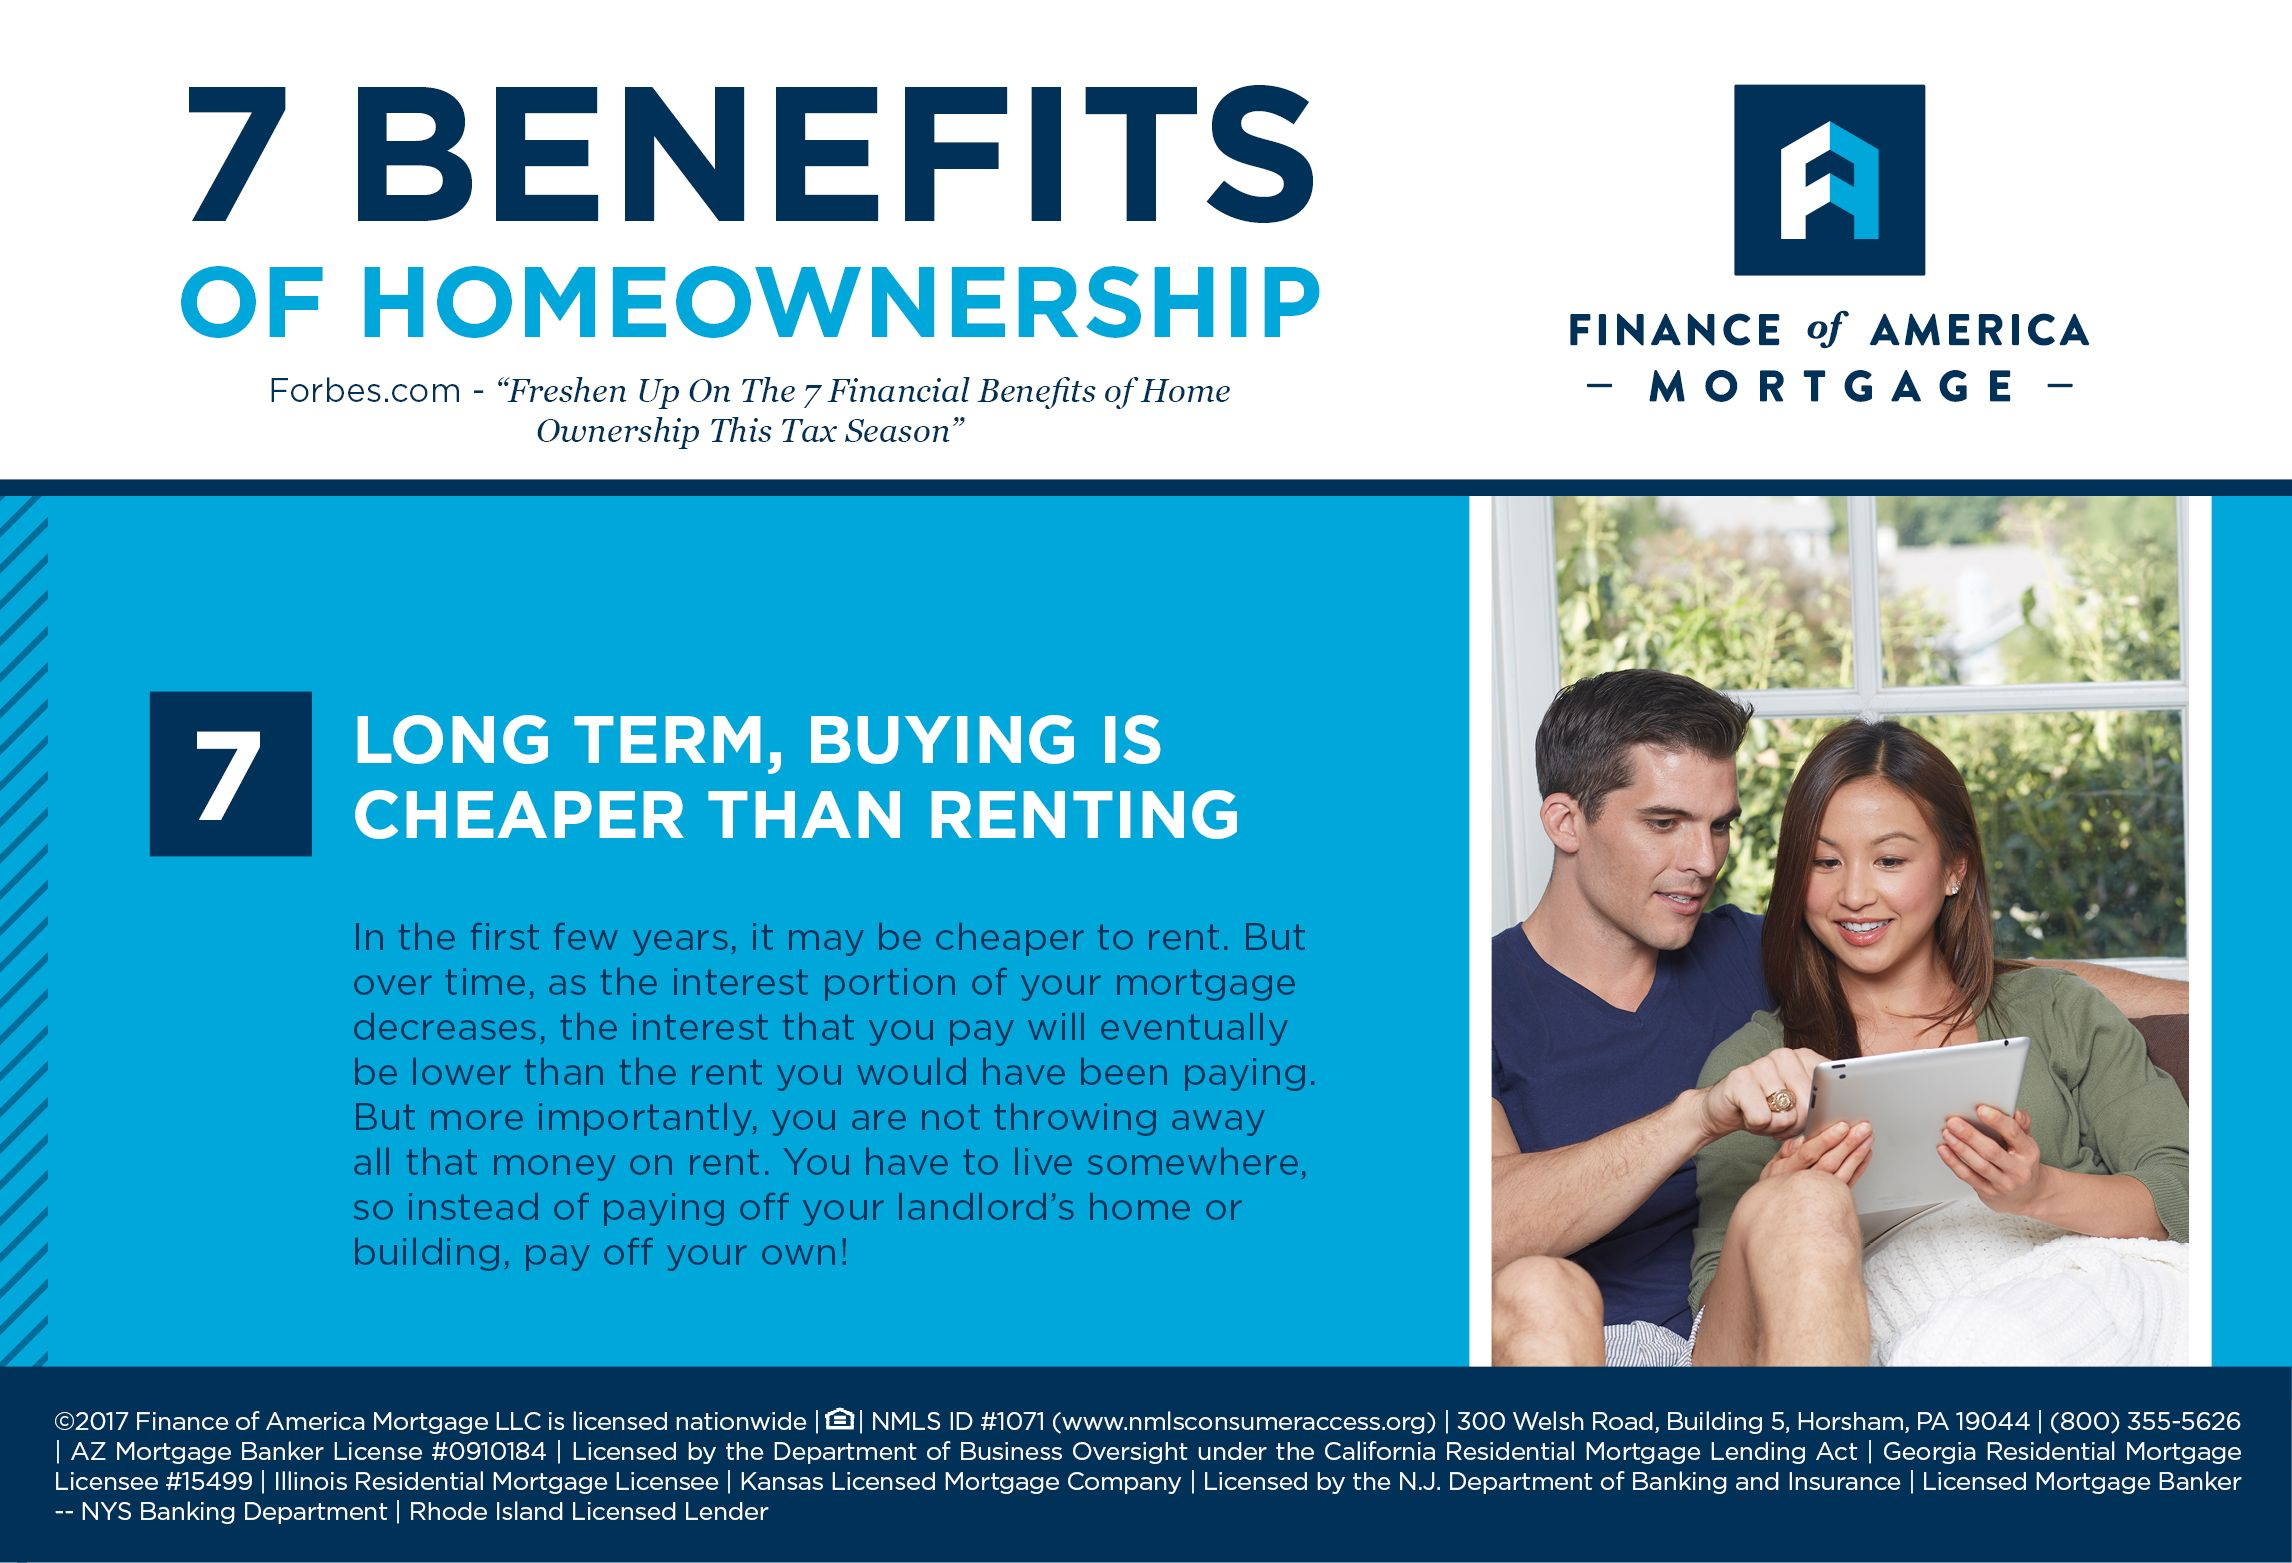 Benefits Of Homeownership Home Ownership Finance Folsom